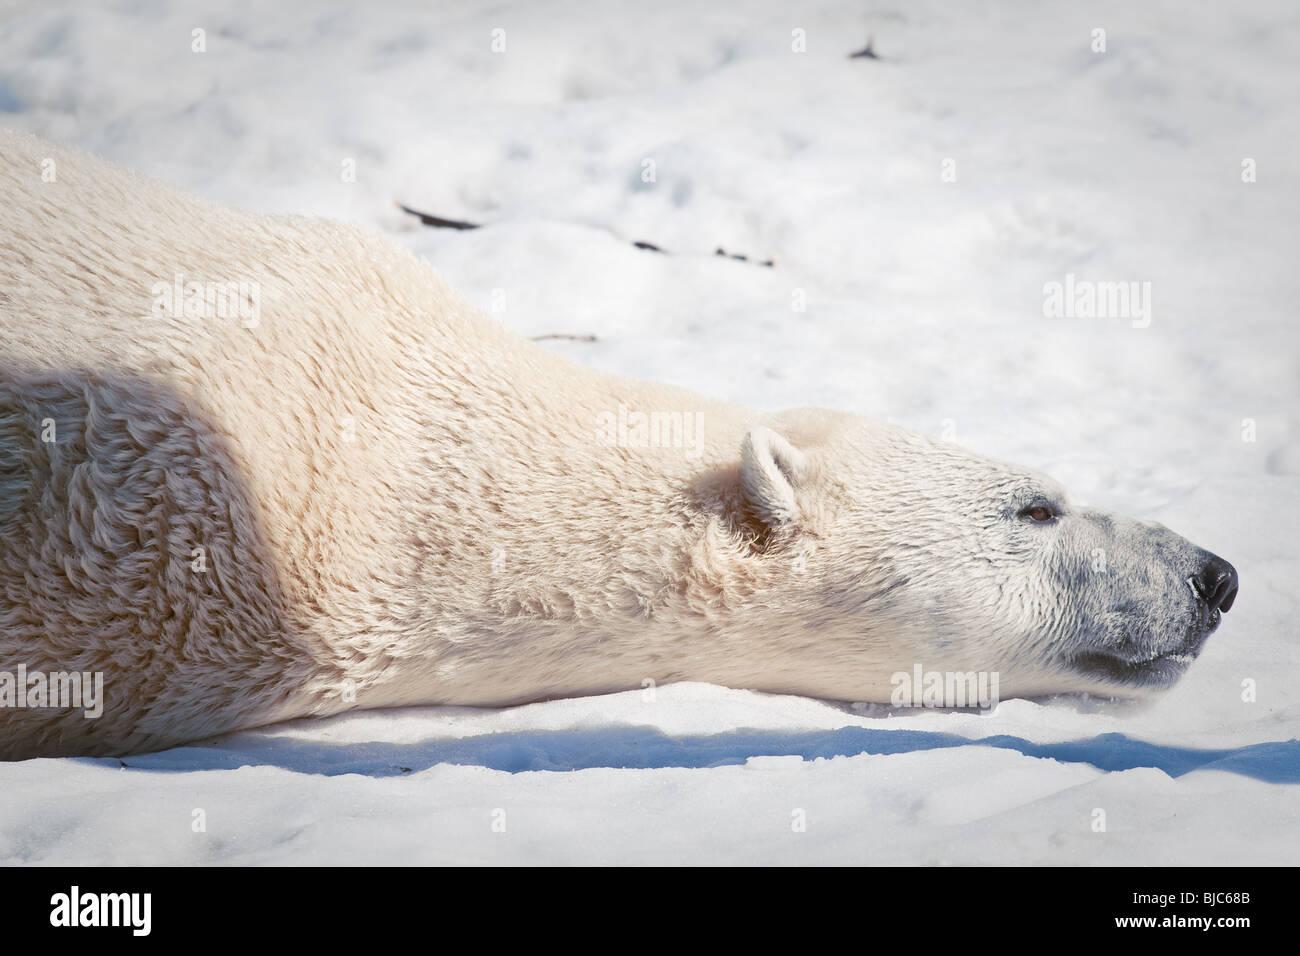 Un Ours blanc (Ursus maritimus - ours polair ou Ours blanc) Photo Stock